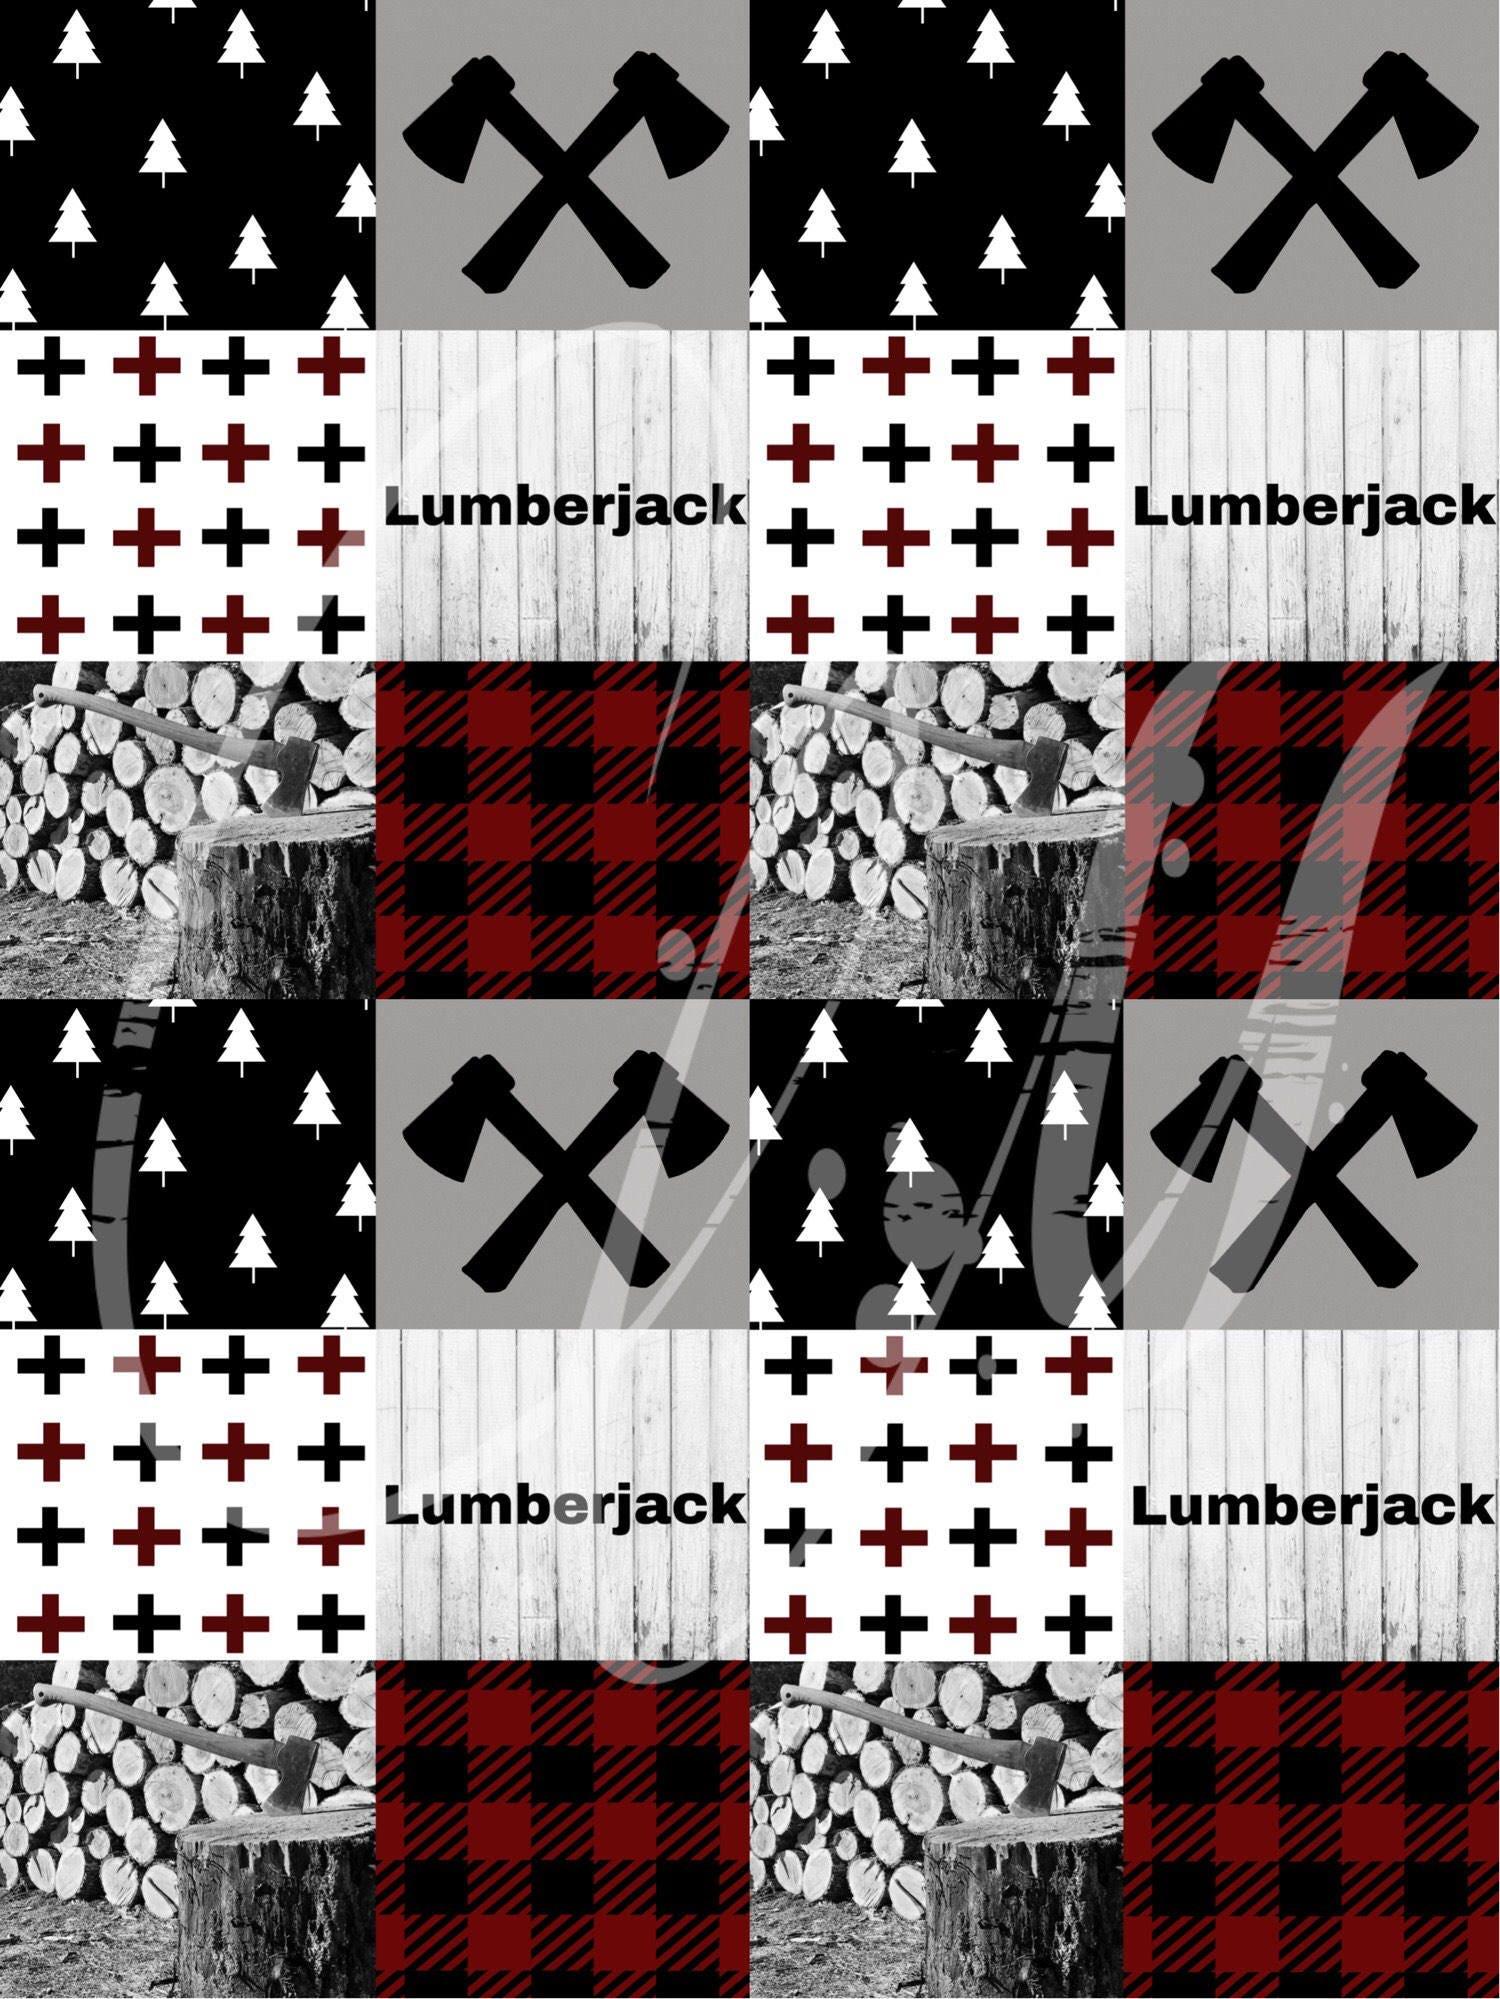 Woodland Fabric Lumberjack Fabric Wholecloth Fabric